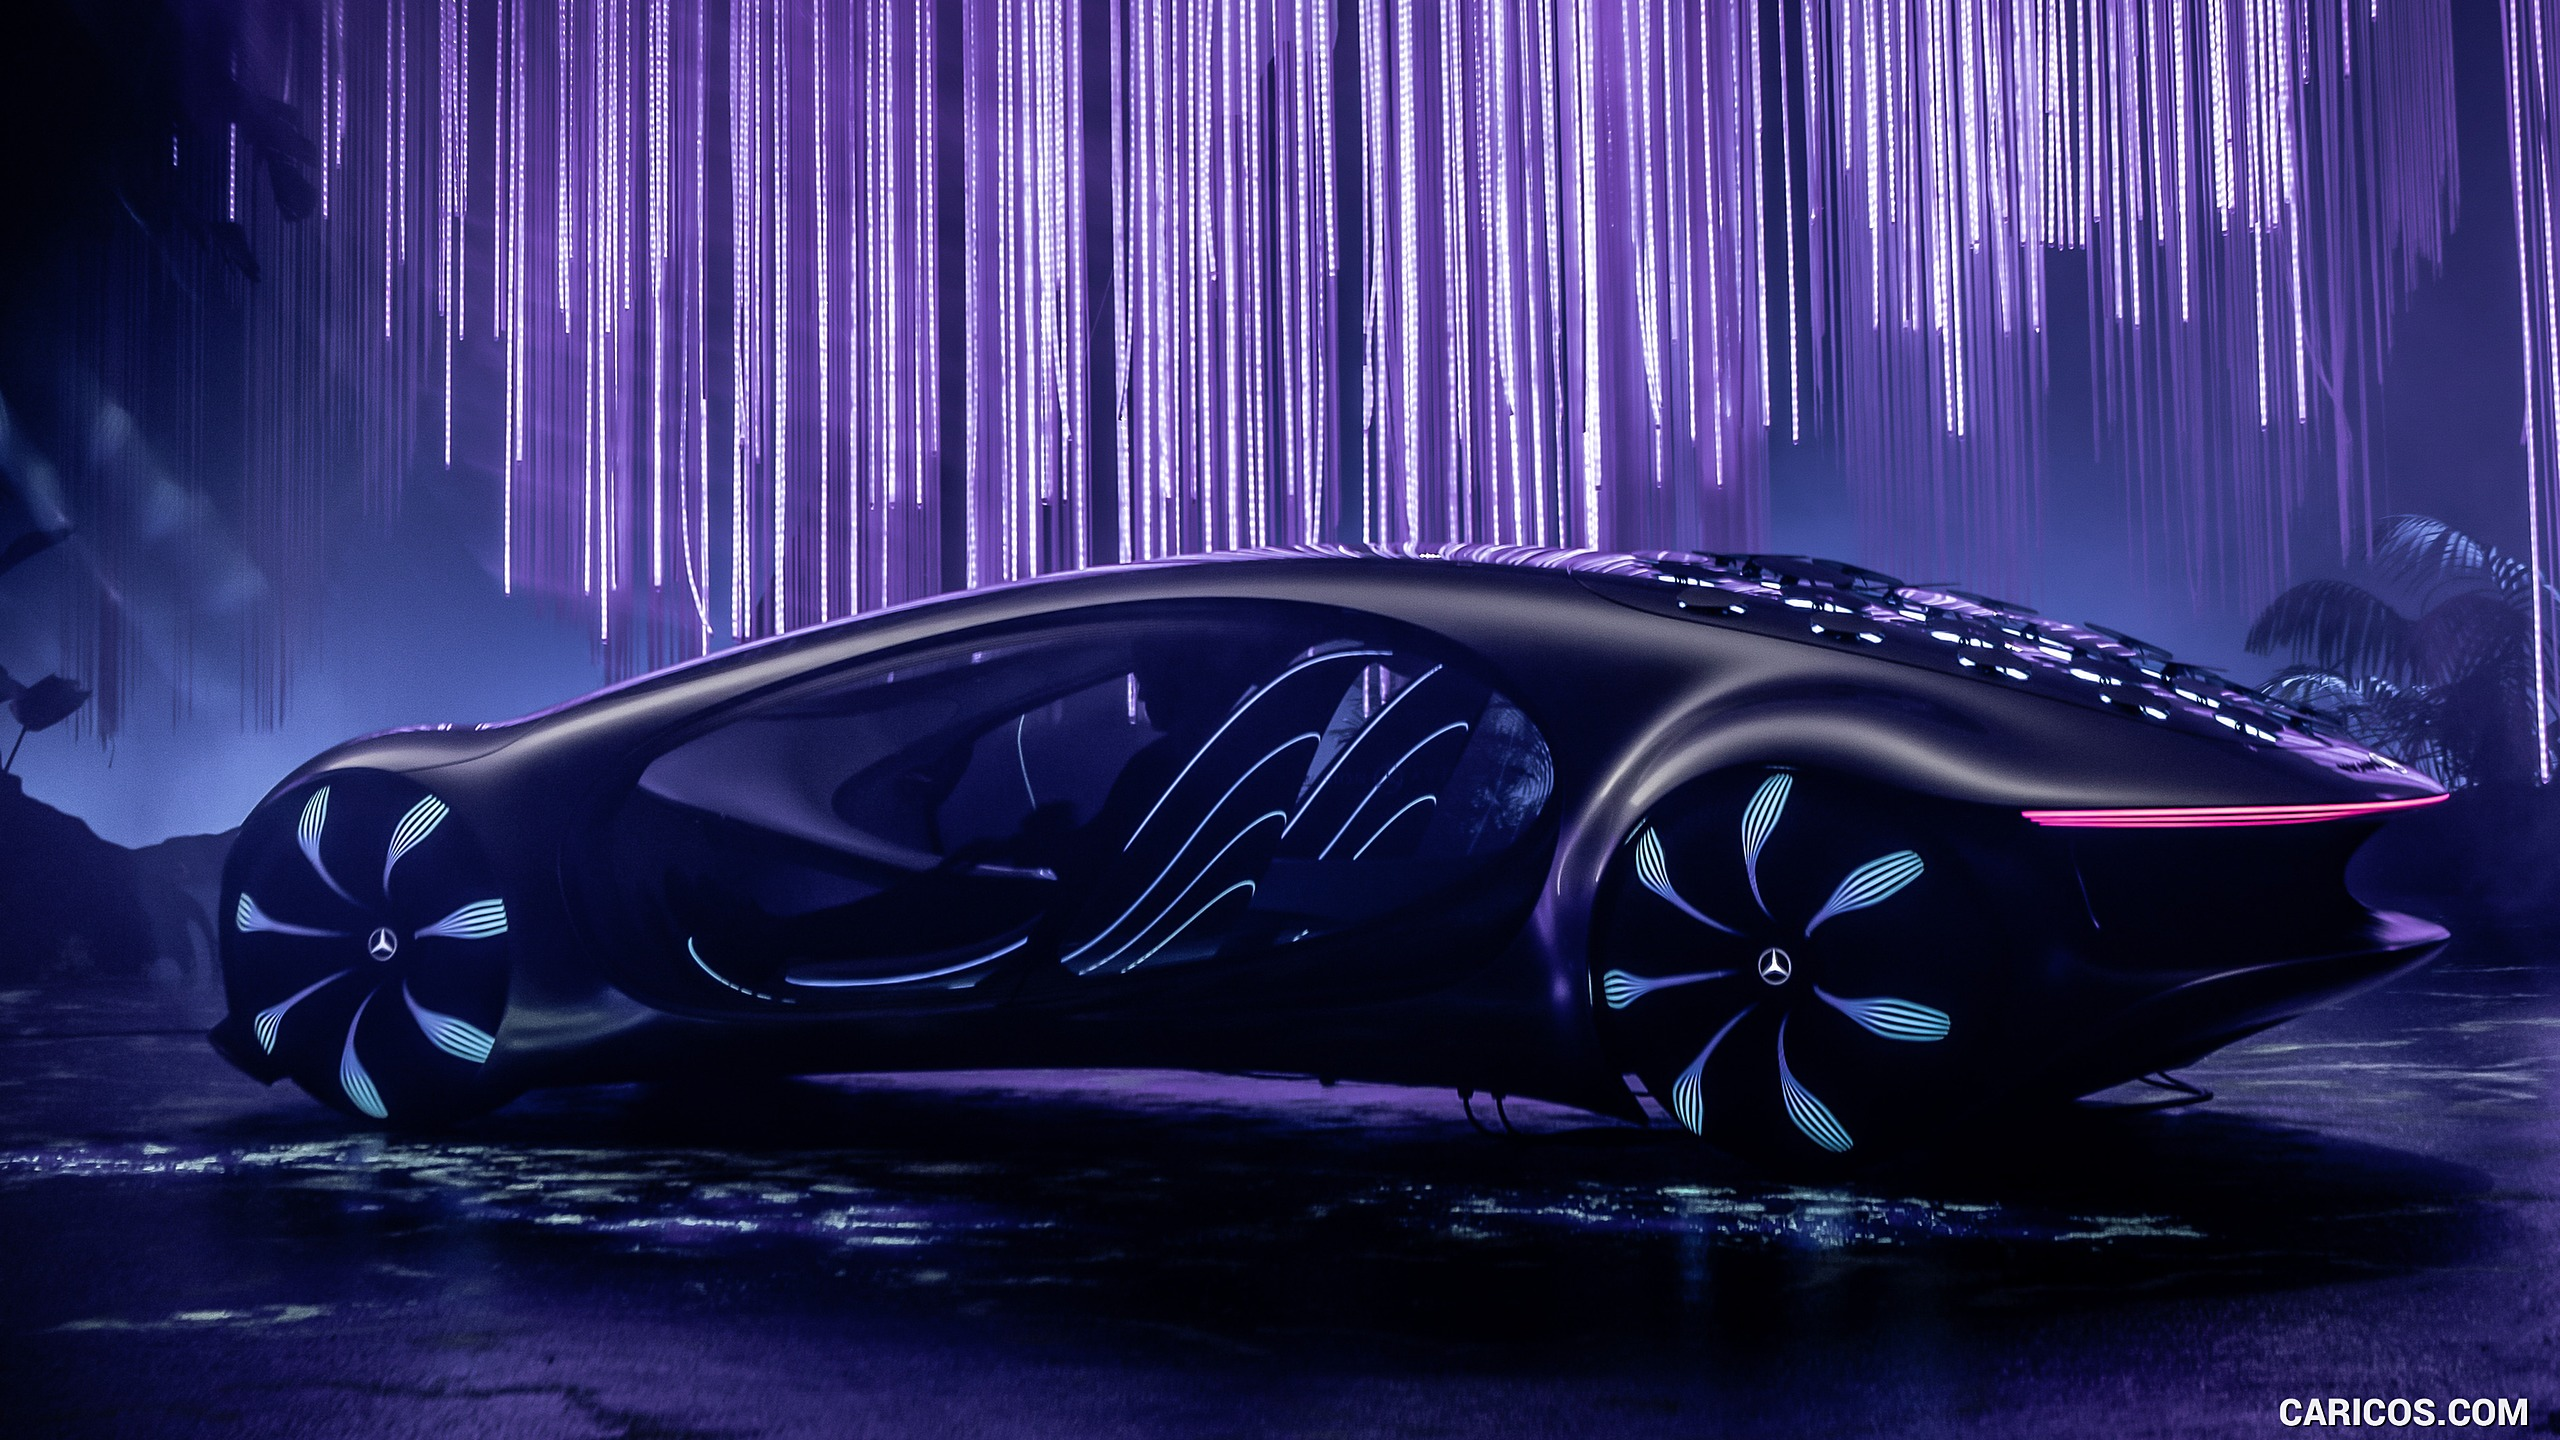 2020 Mercedes Benz VISION AVTR Concept   Side HD Wallpaper 12 2560x1440